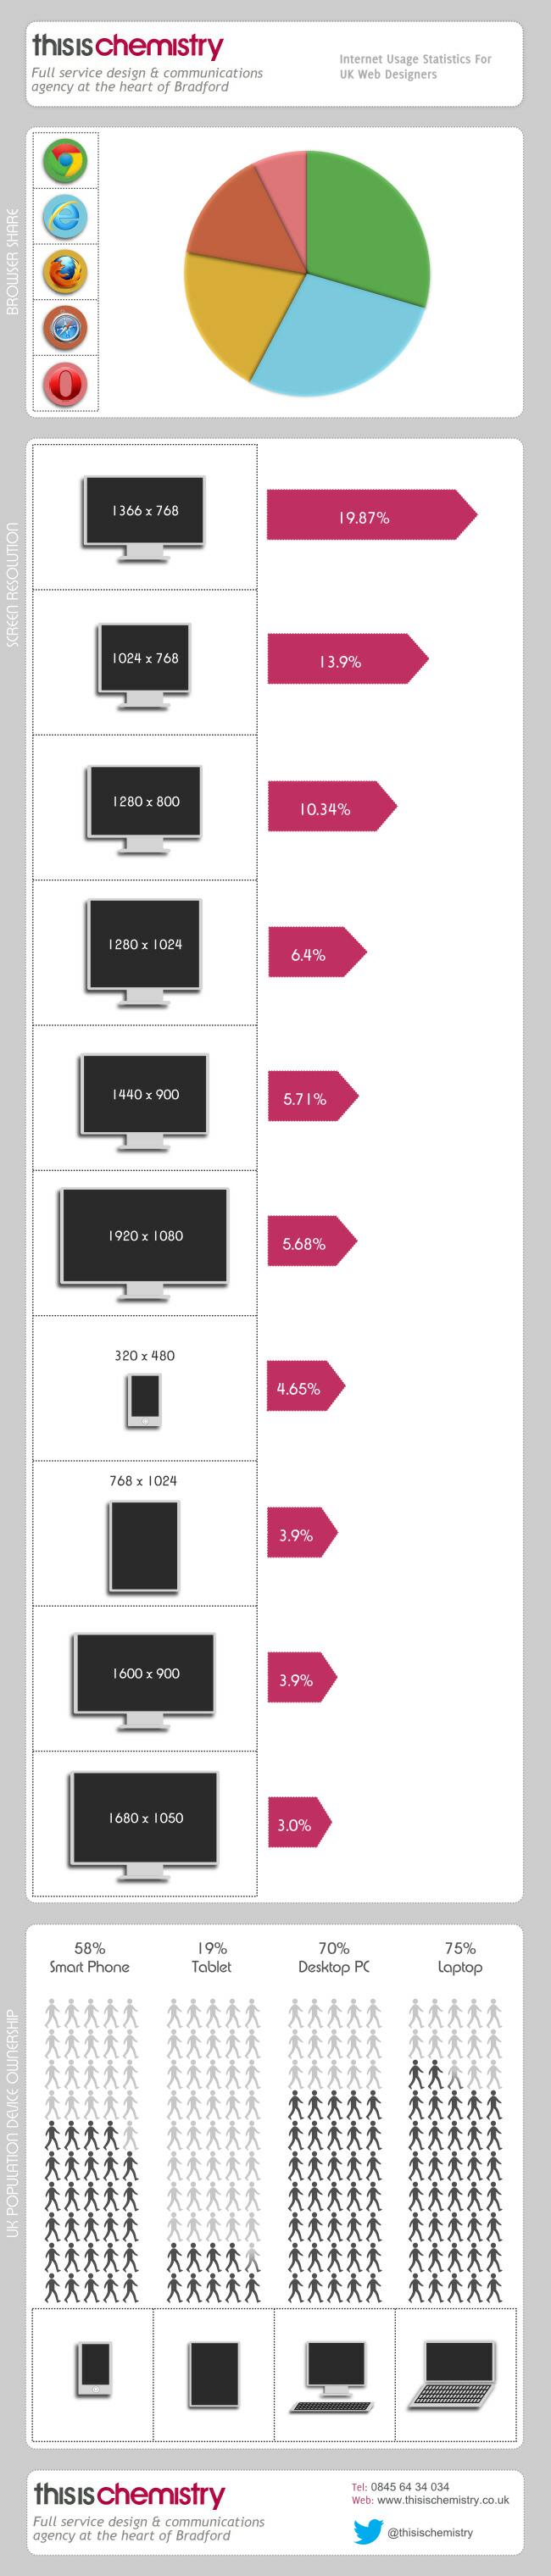 Screen Resolution Statistics for Mobile Smartphones, Tablets